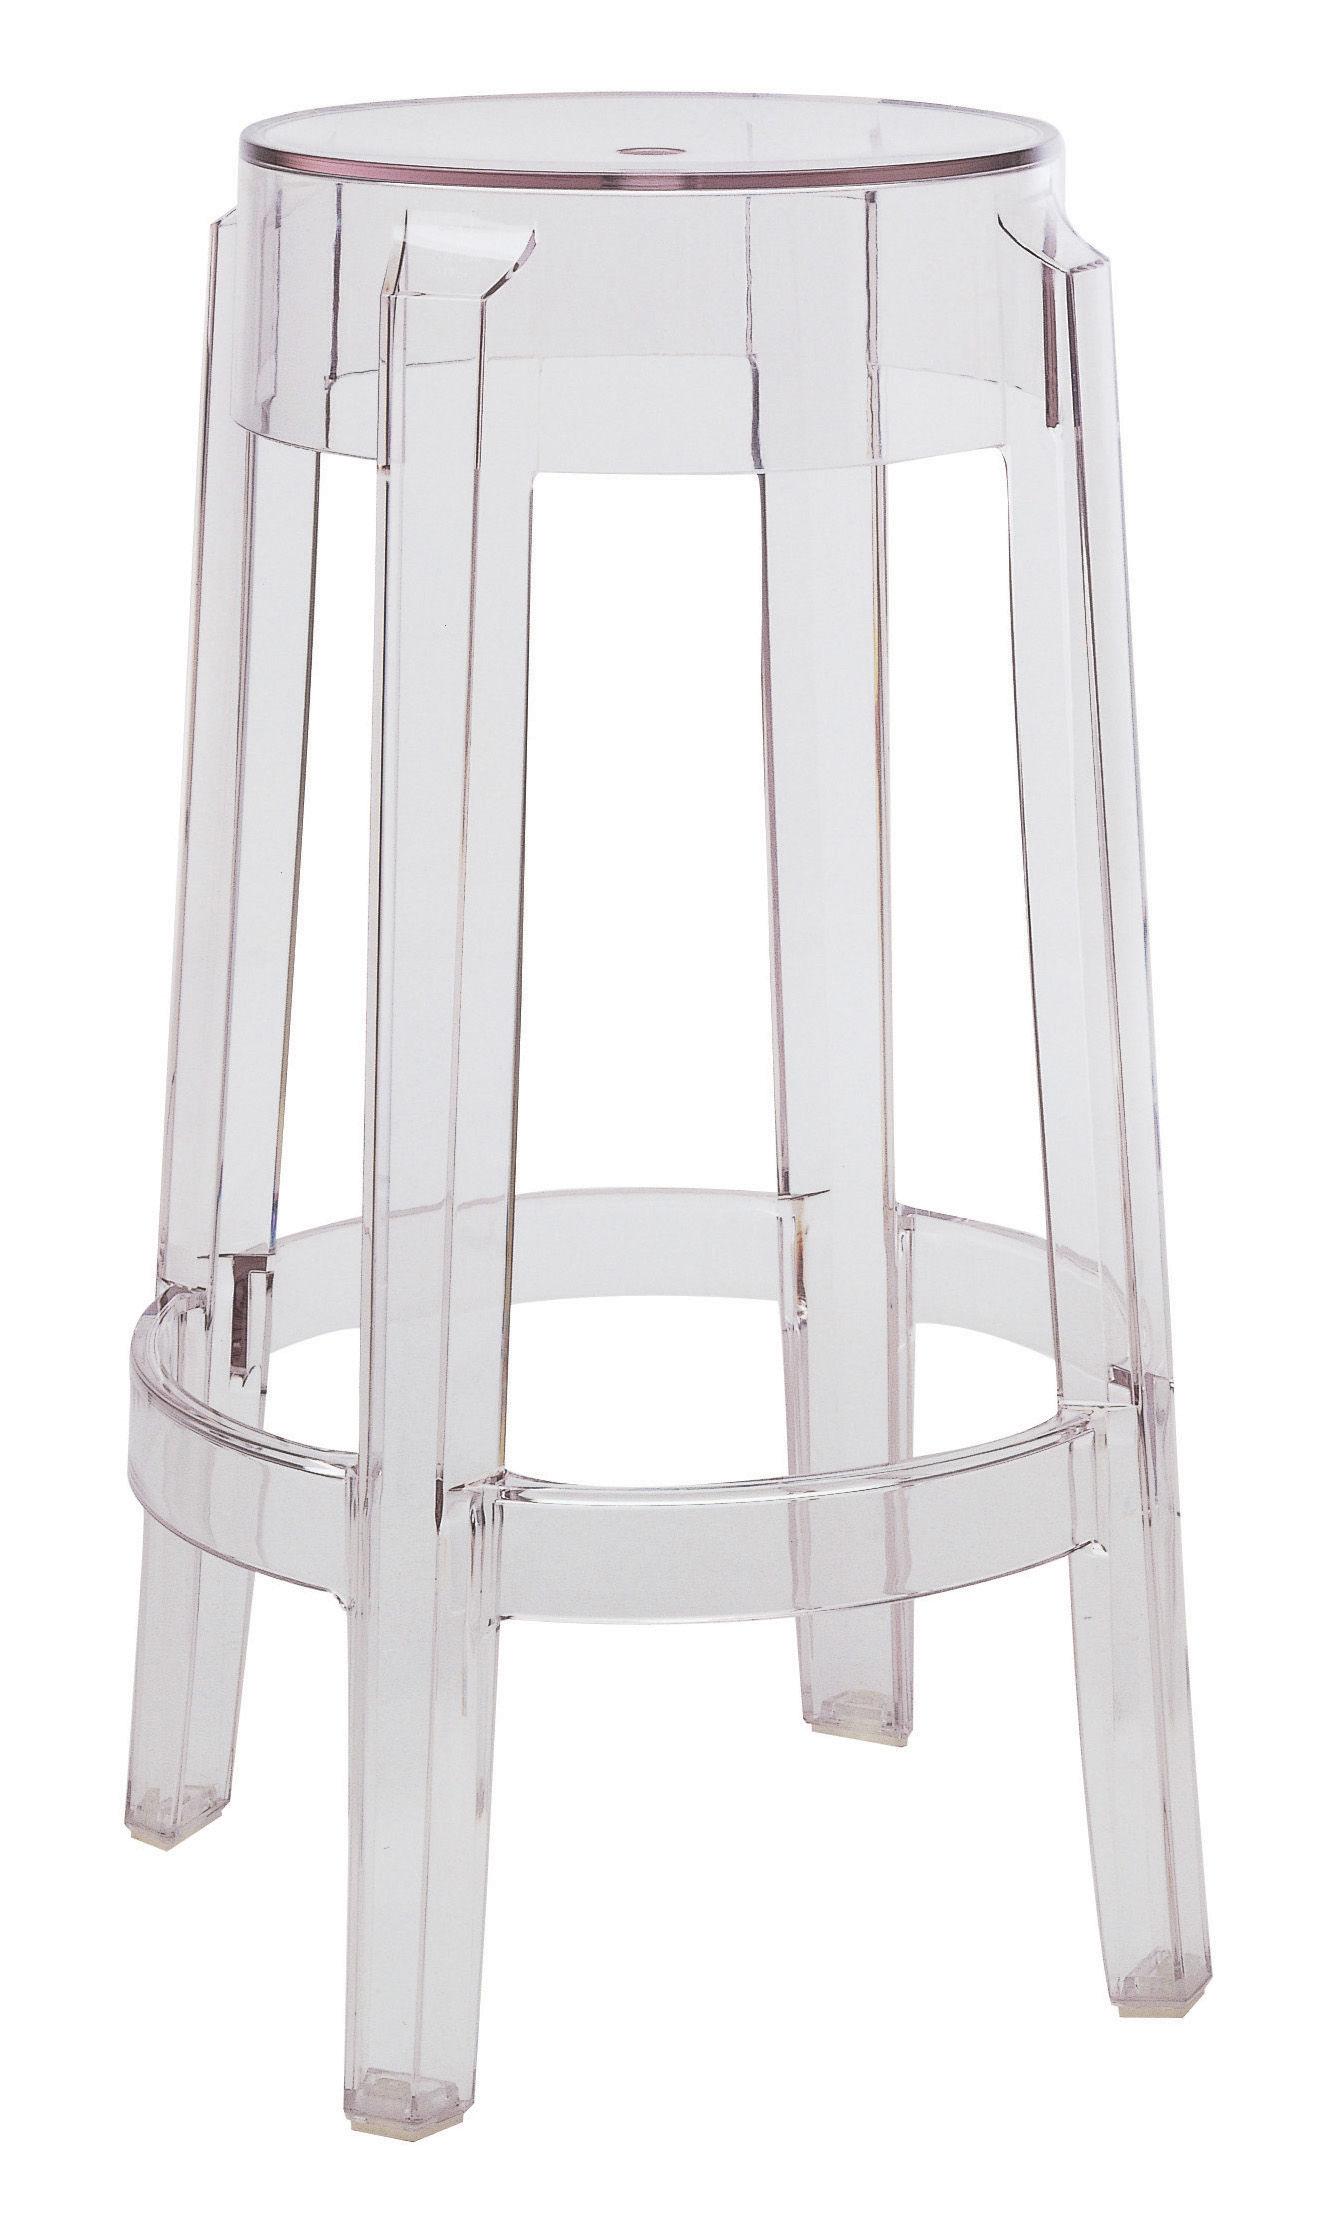 Möbel - Barhocker - Charles Ghost Stapelbarer Barhocker 65 cm - Kartell - Kristall - Polykarbonat